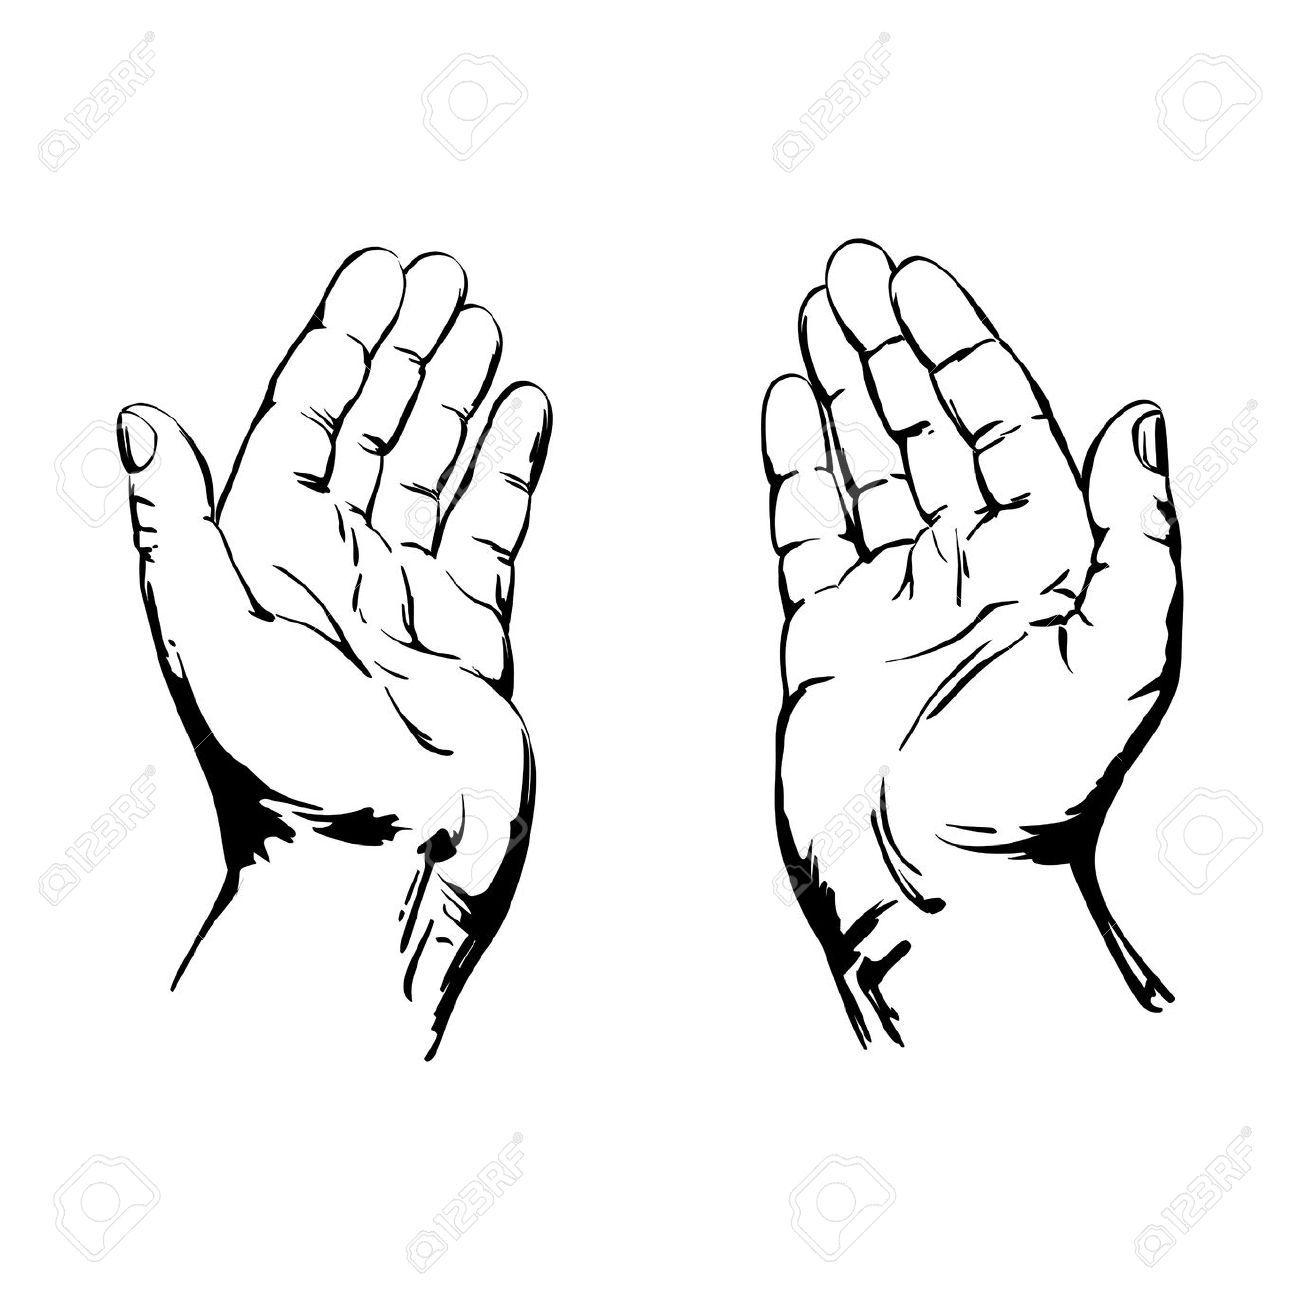 18059794 Praying Hands Stock Vector God Hand Jpg 1300 1300 Praying Hands Drawing Praying Hands How To Draw Hands